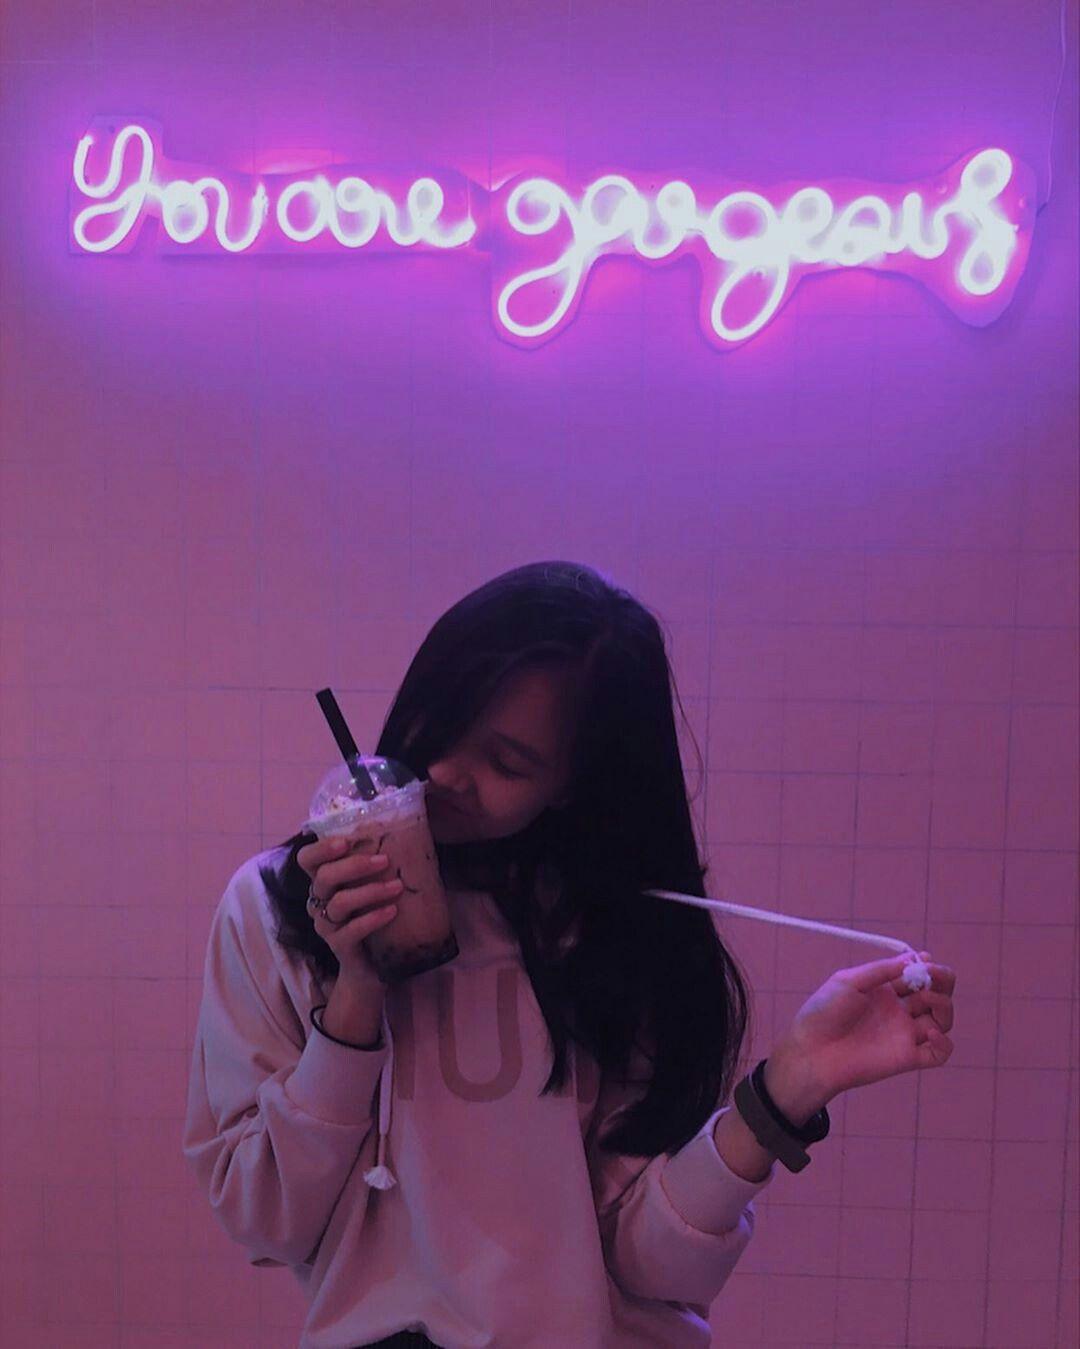 Pin Oleh ช ม น ช ดอ าส Di Girl Di 2020 Fotografi Remaja Potret Diri Gadis Tumblr